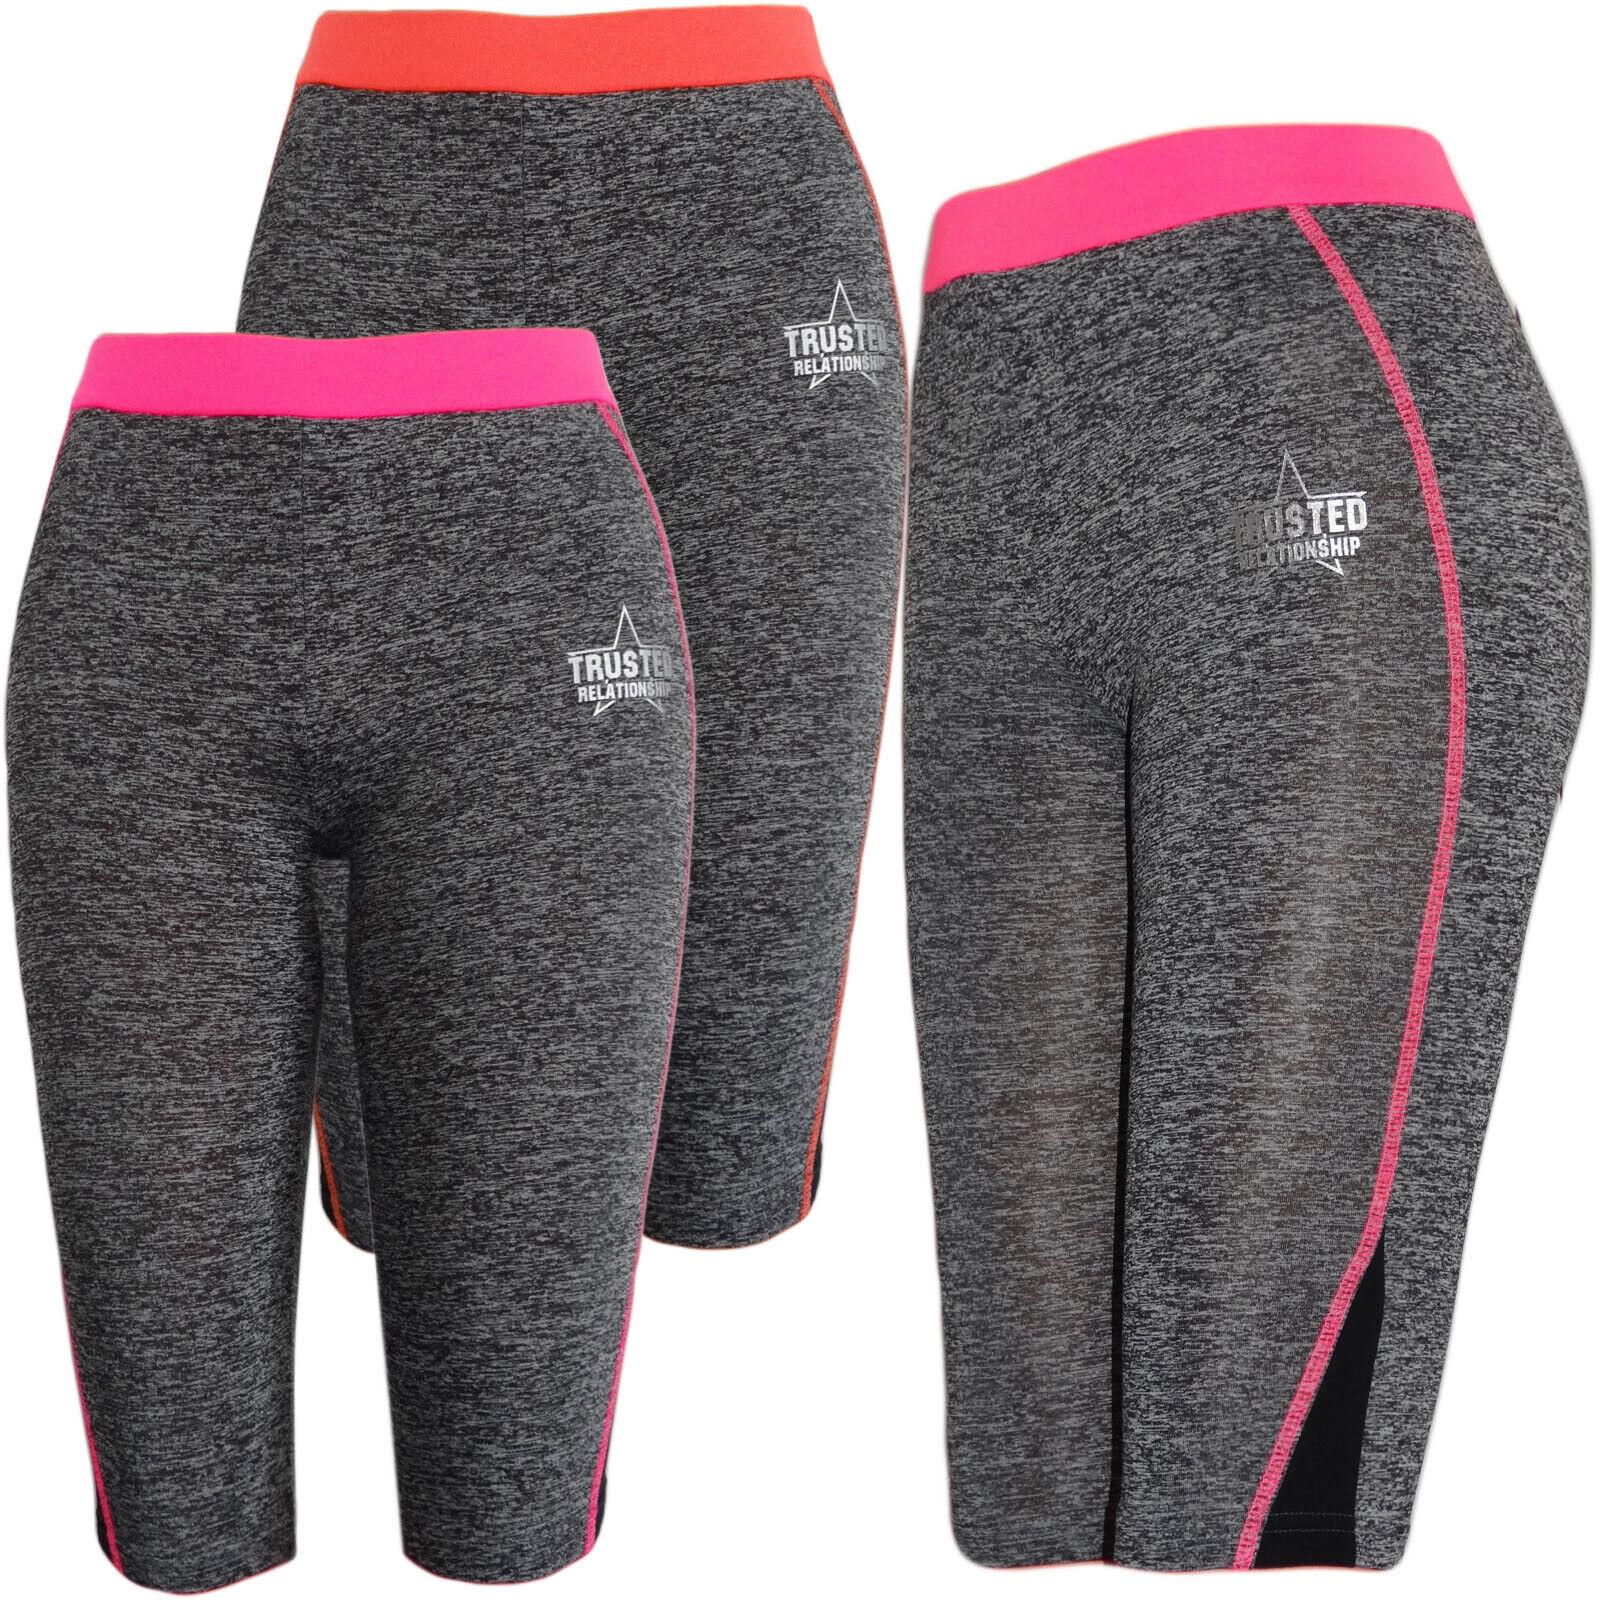 e7d345f394922f Mädchen Kinder Freizeit Capri Leggings Hose Training Leggins Sporthose  Melierte